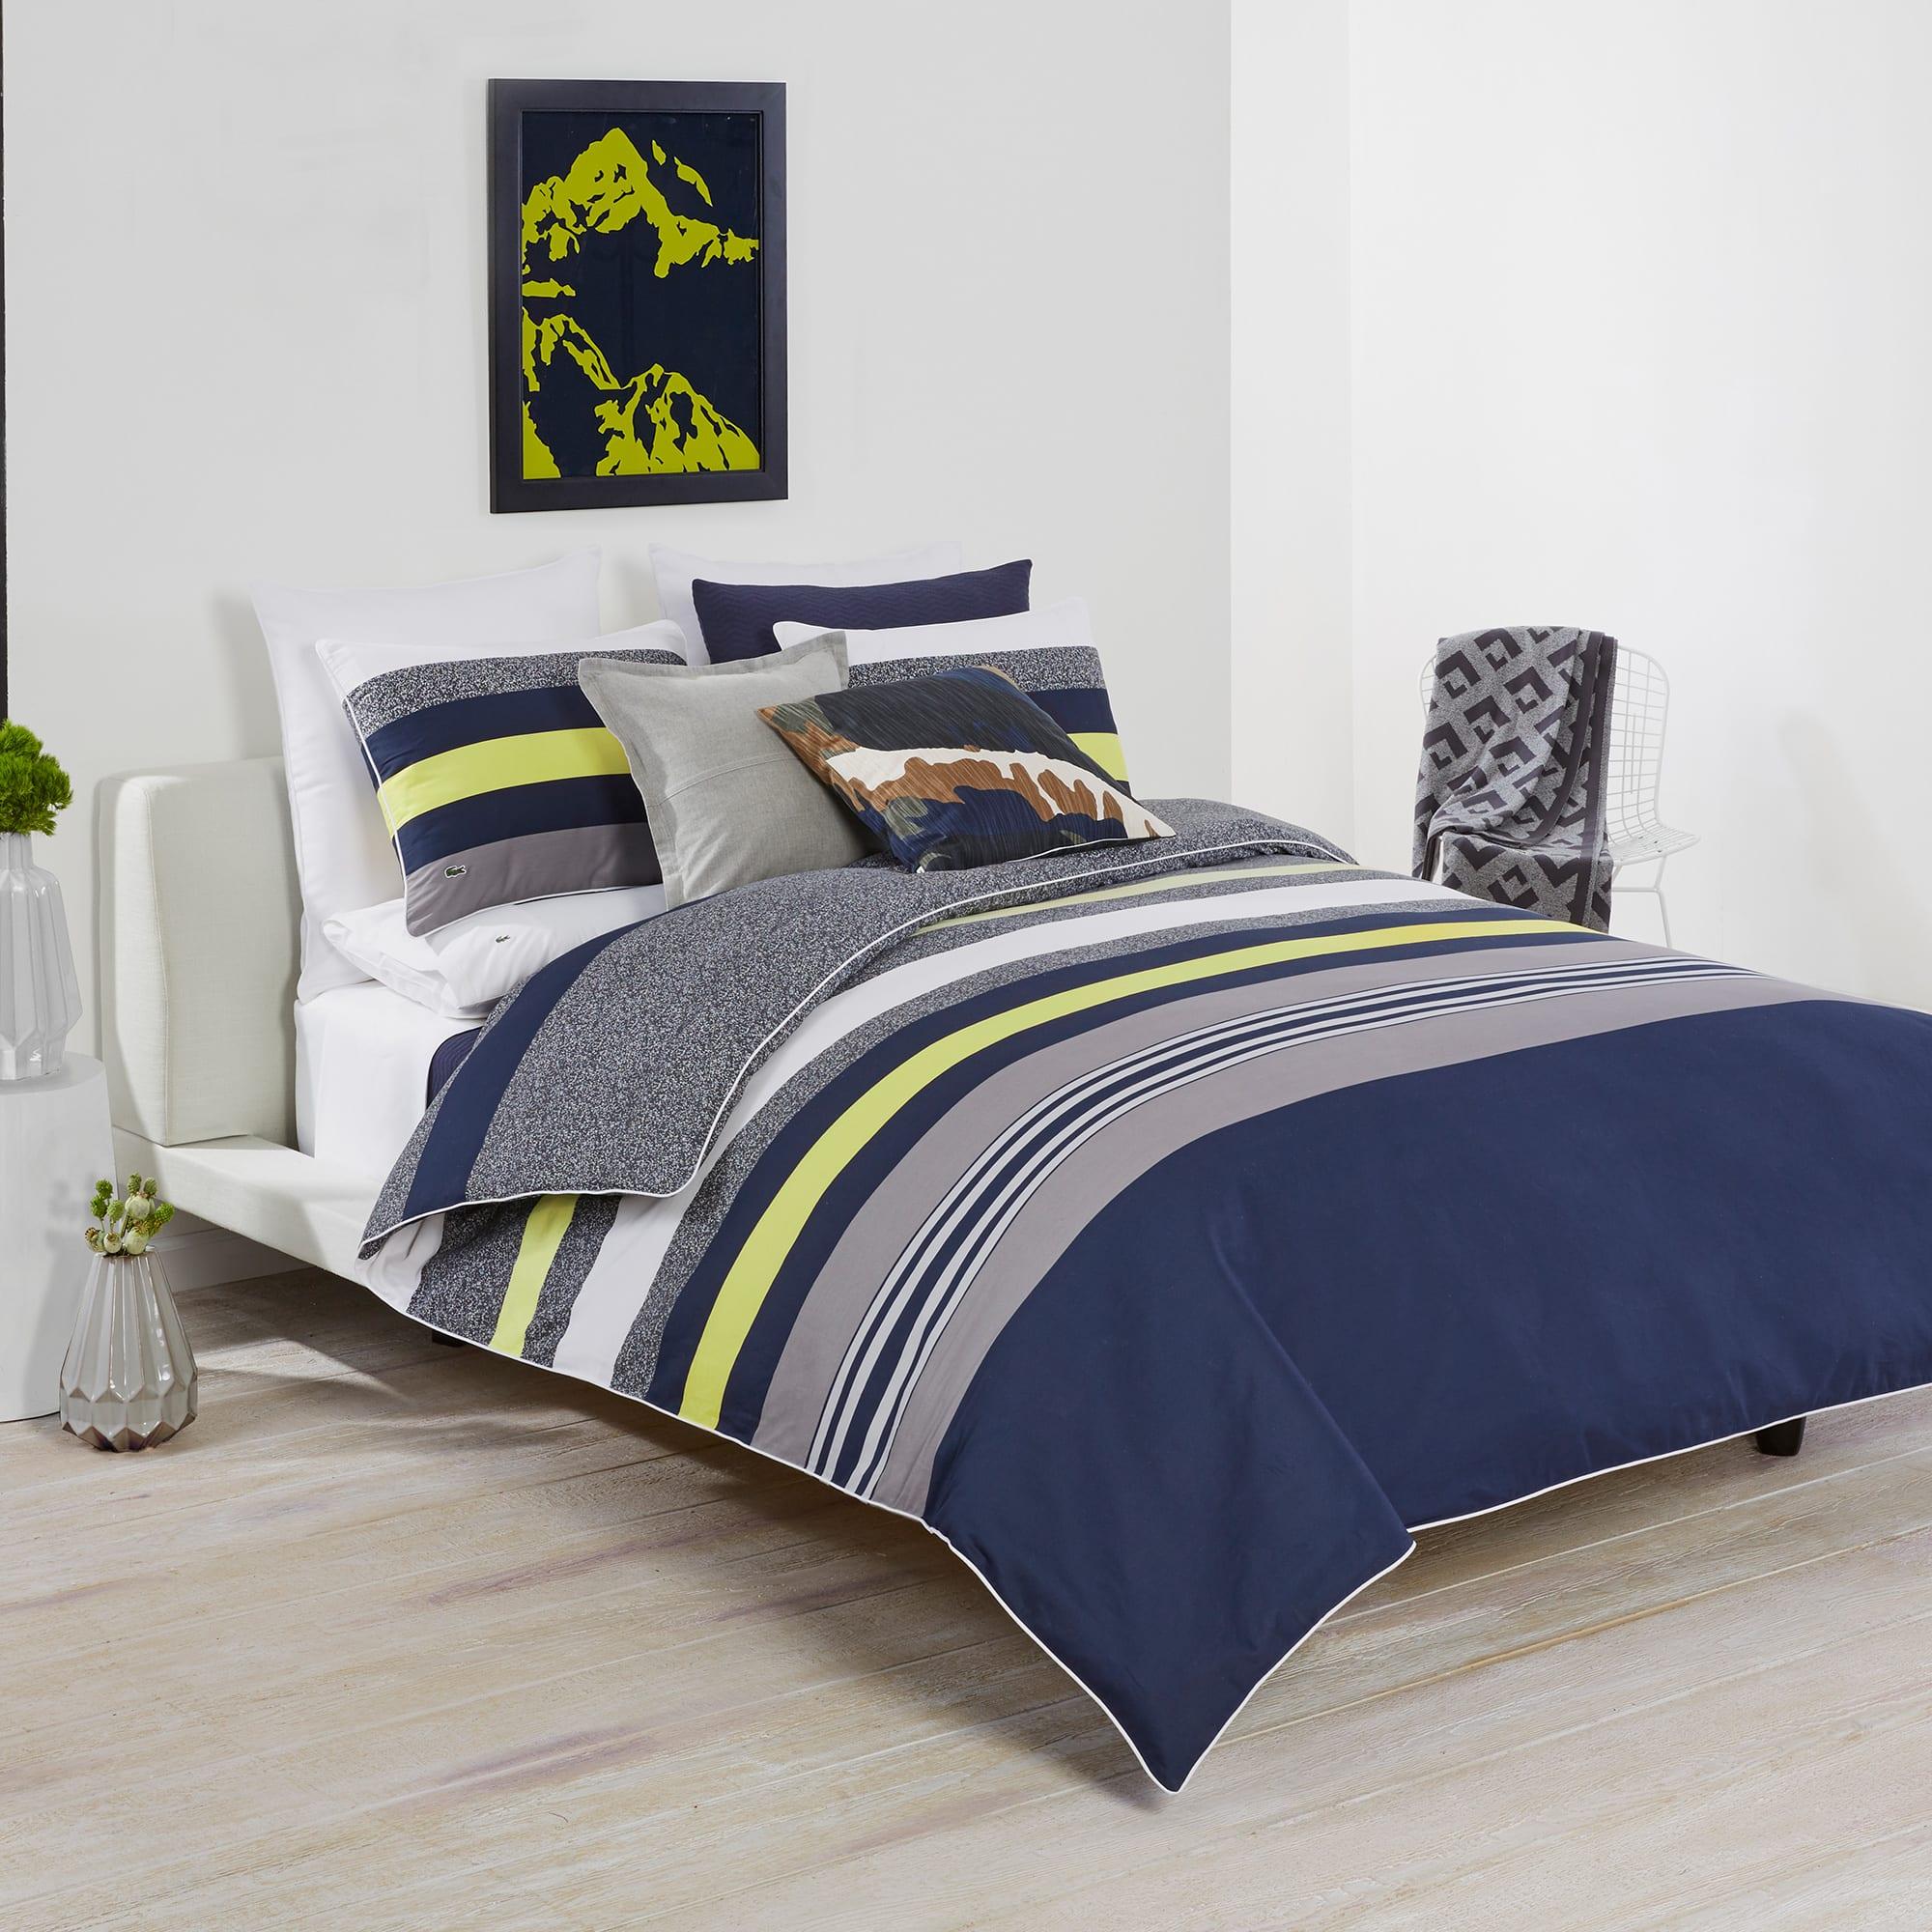 Tigne Full/Queen Comforter Set